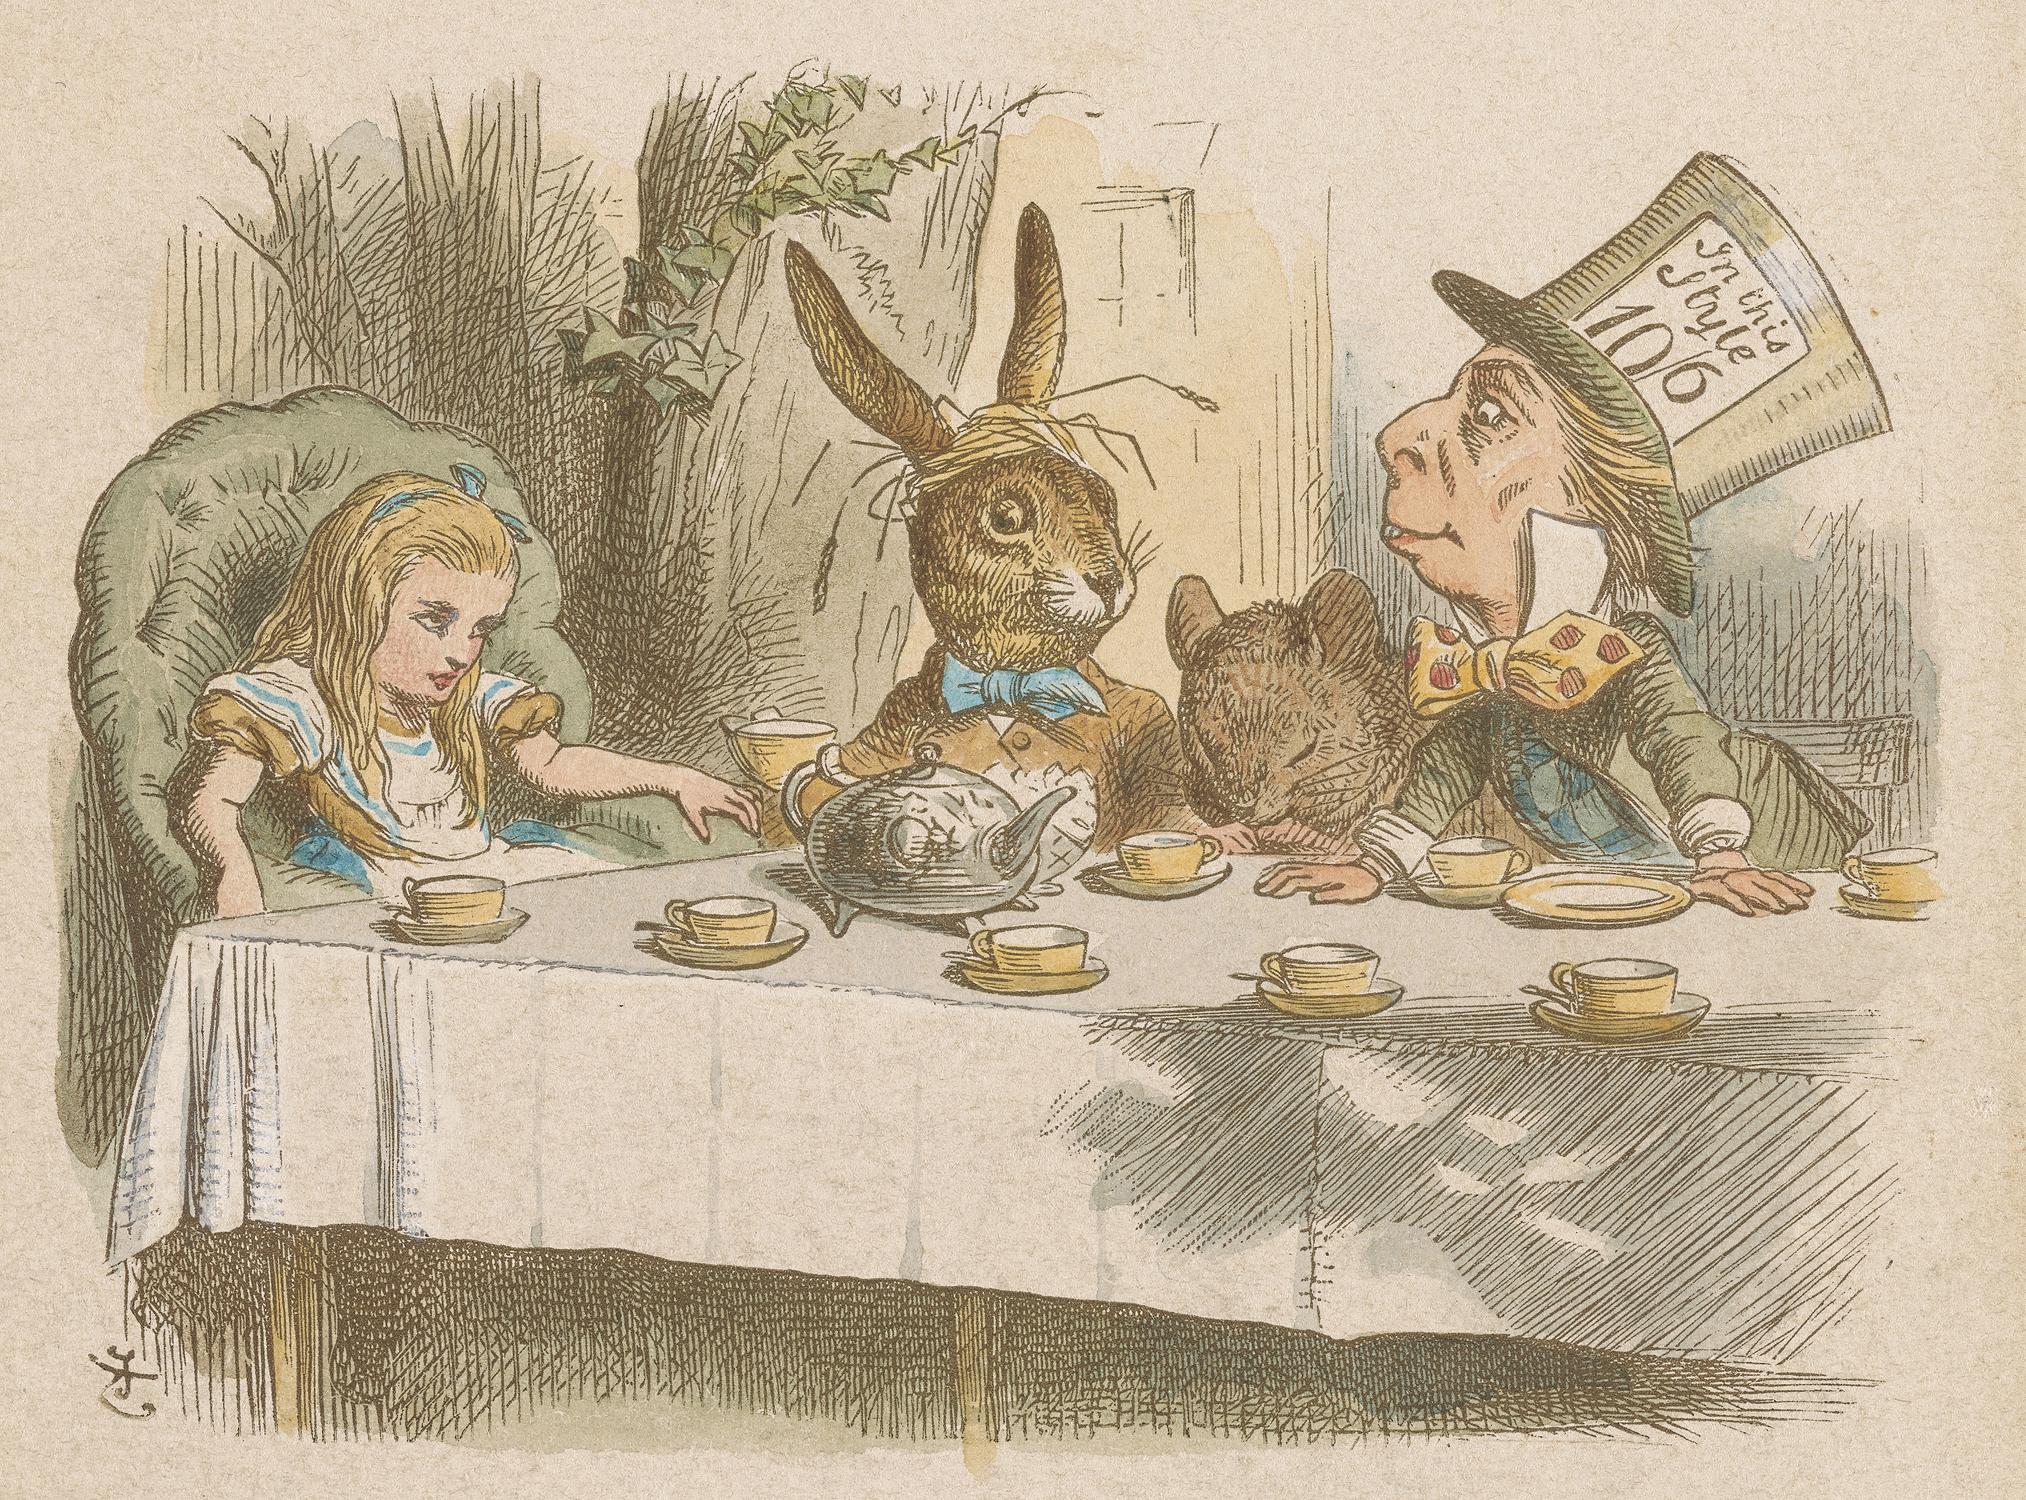 Walt Disneys Alice in Wonderland Little Golden Books